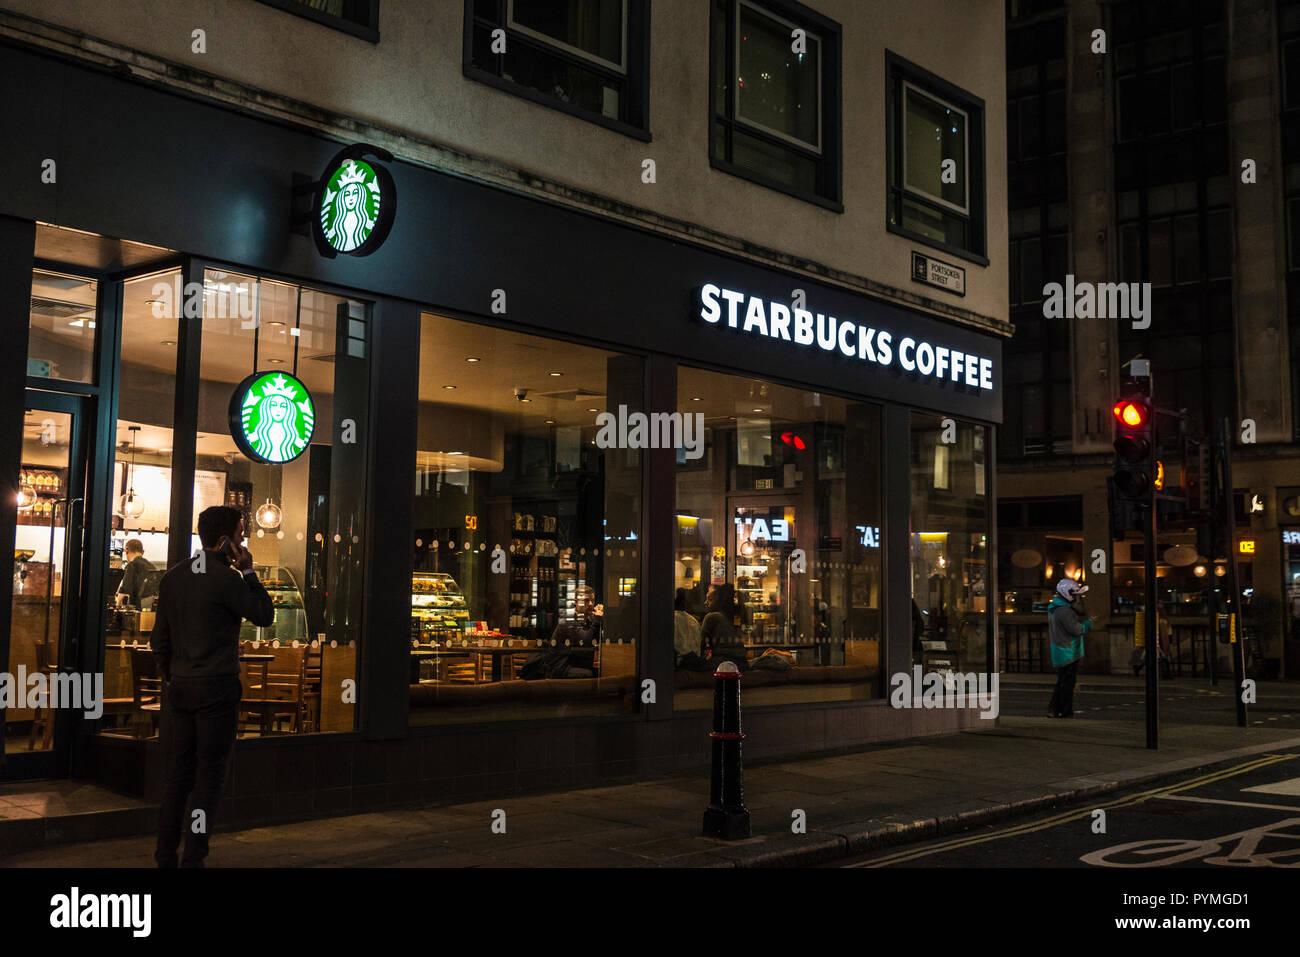 Starbucks Coffee Sign Logo London Stock Photos & Starbucks